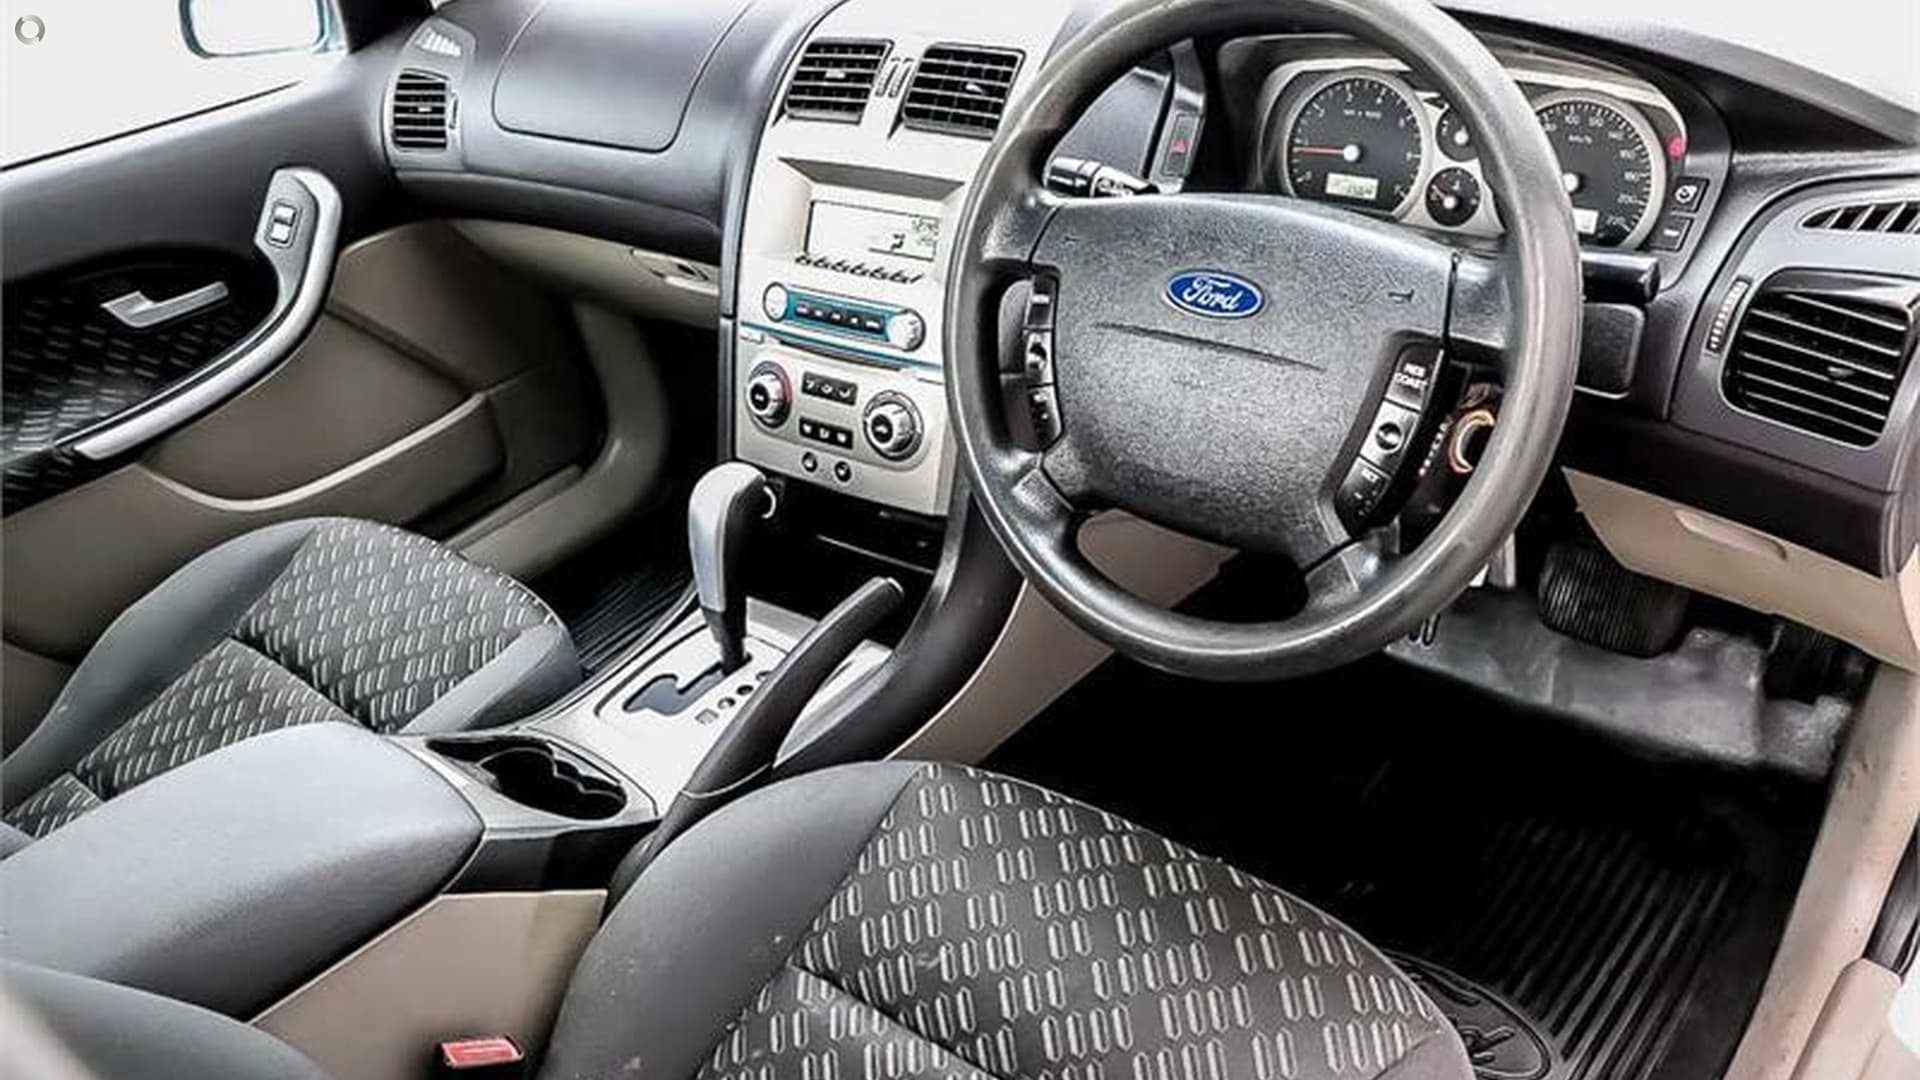 2008 Ford Falcon Ute XL BF Mk II